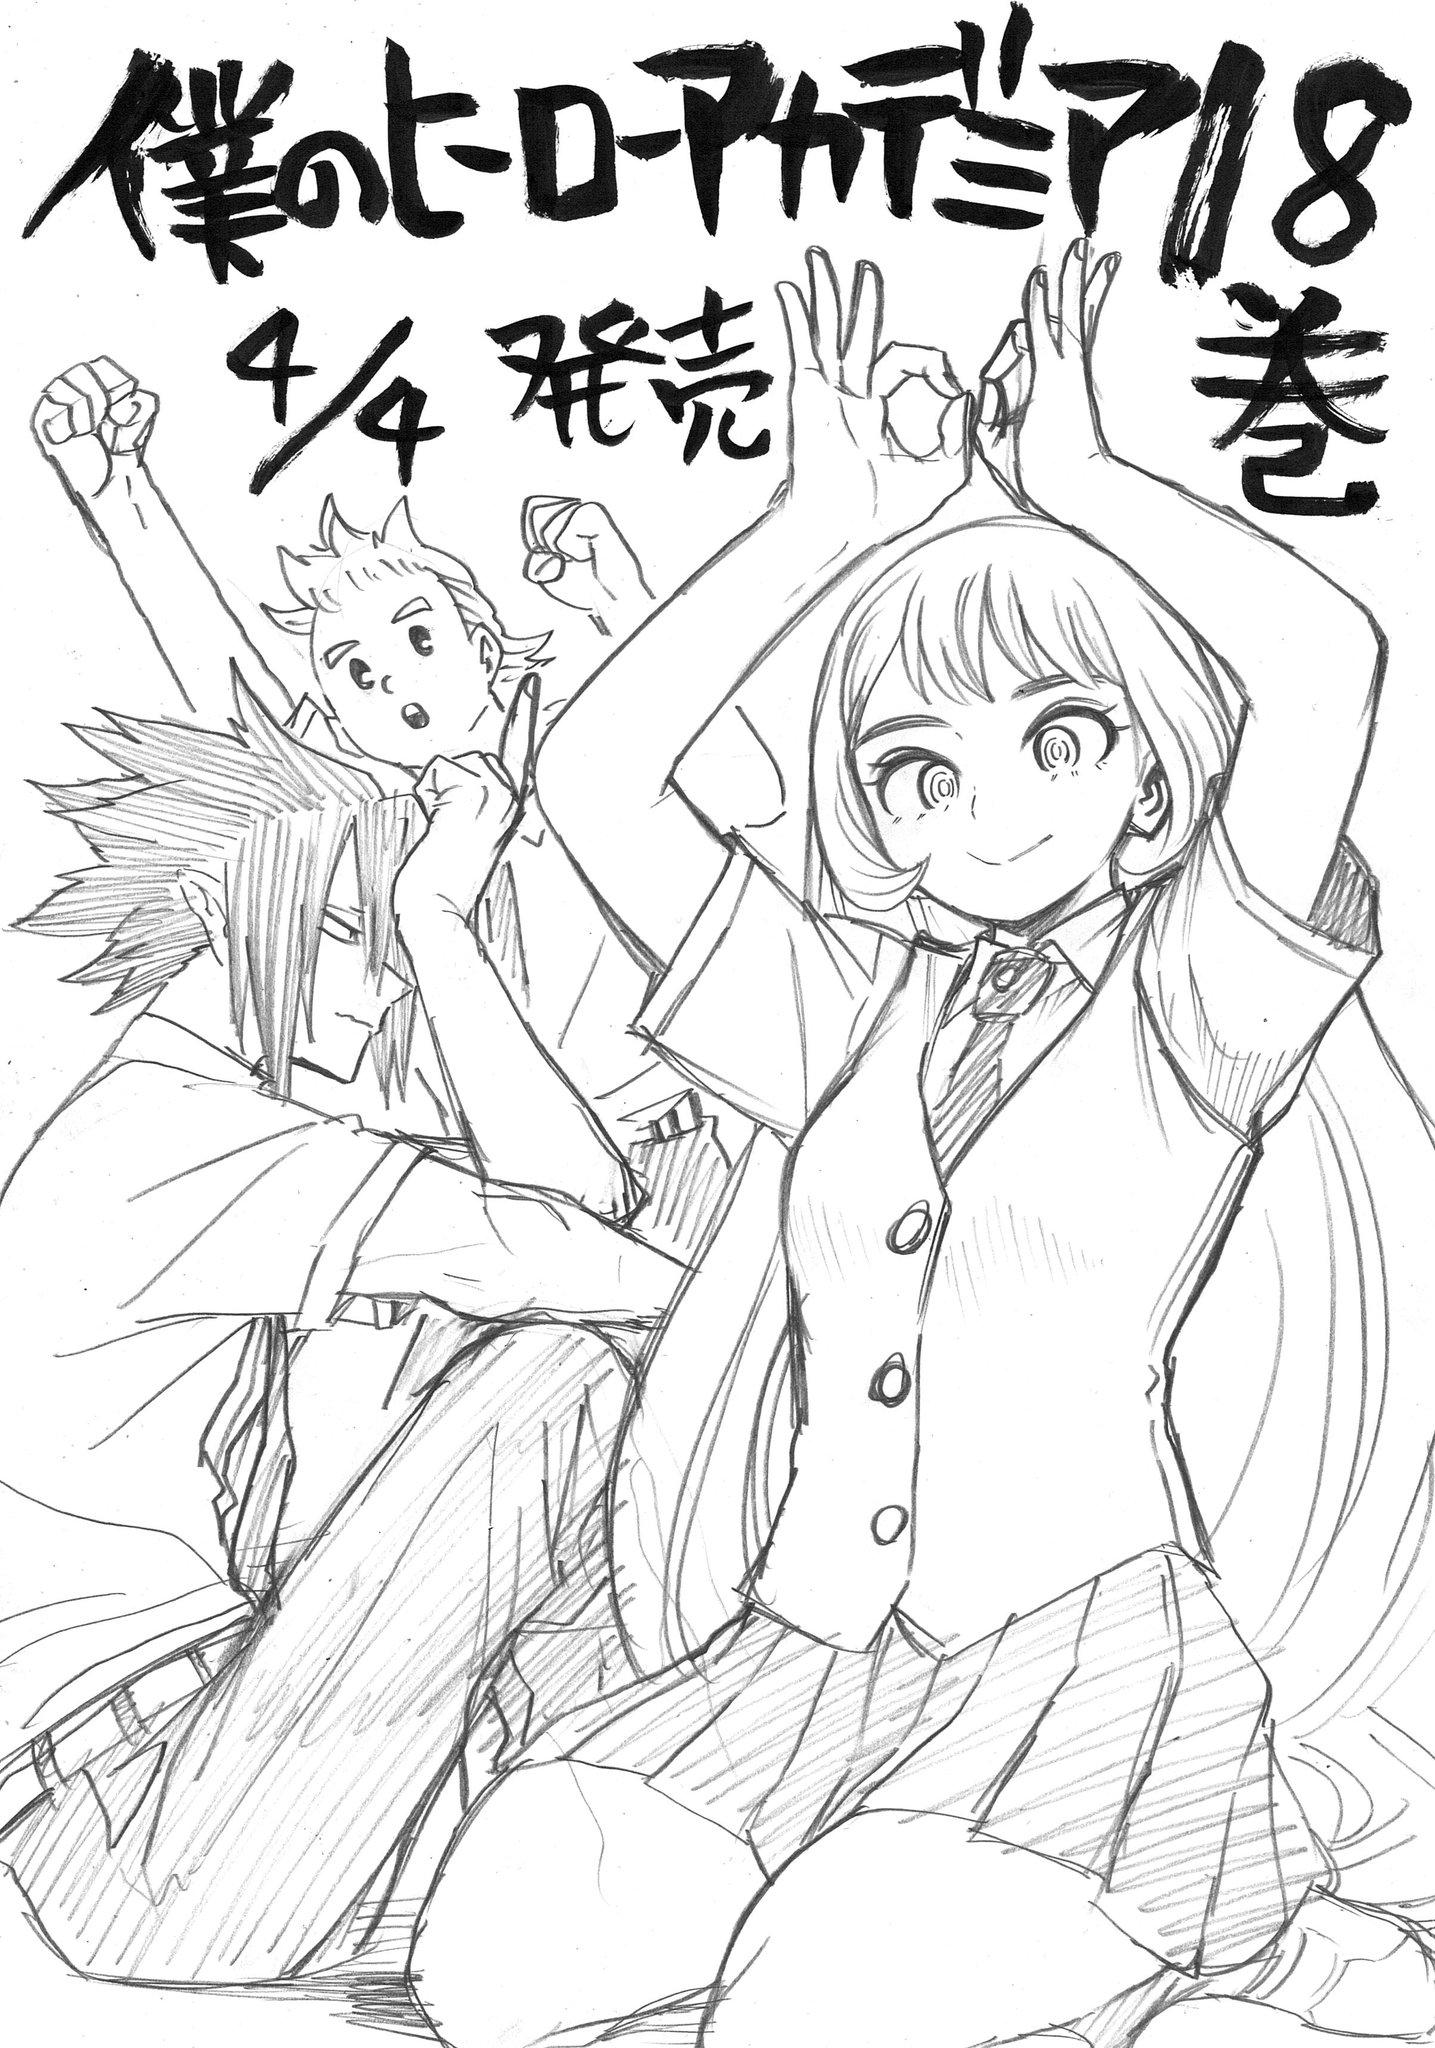 Volume 18 Sketch